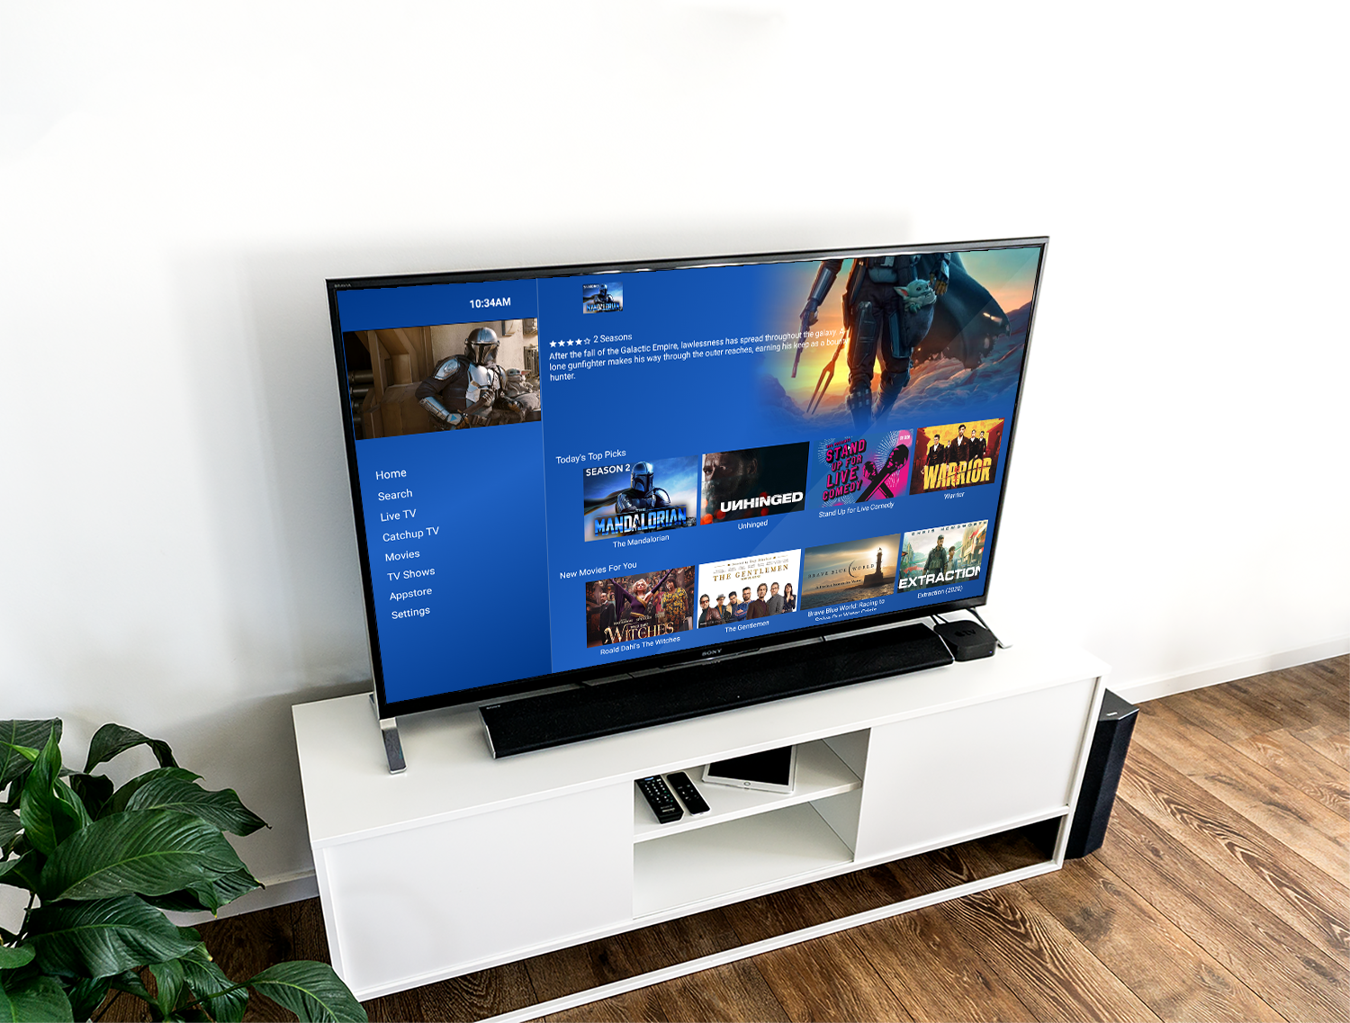 Smart TV Modern Room Mockup Pure TV Deluxe